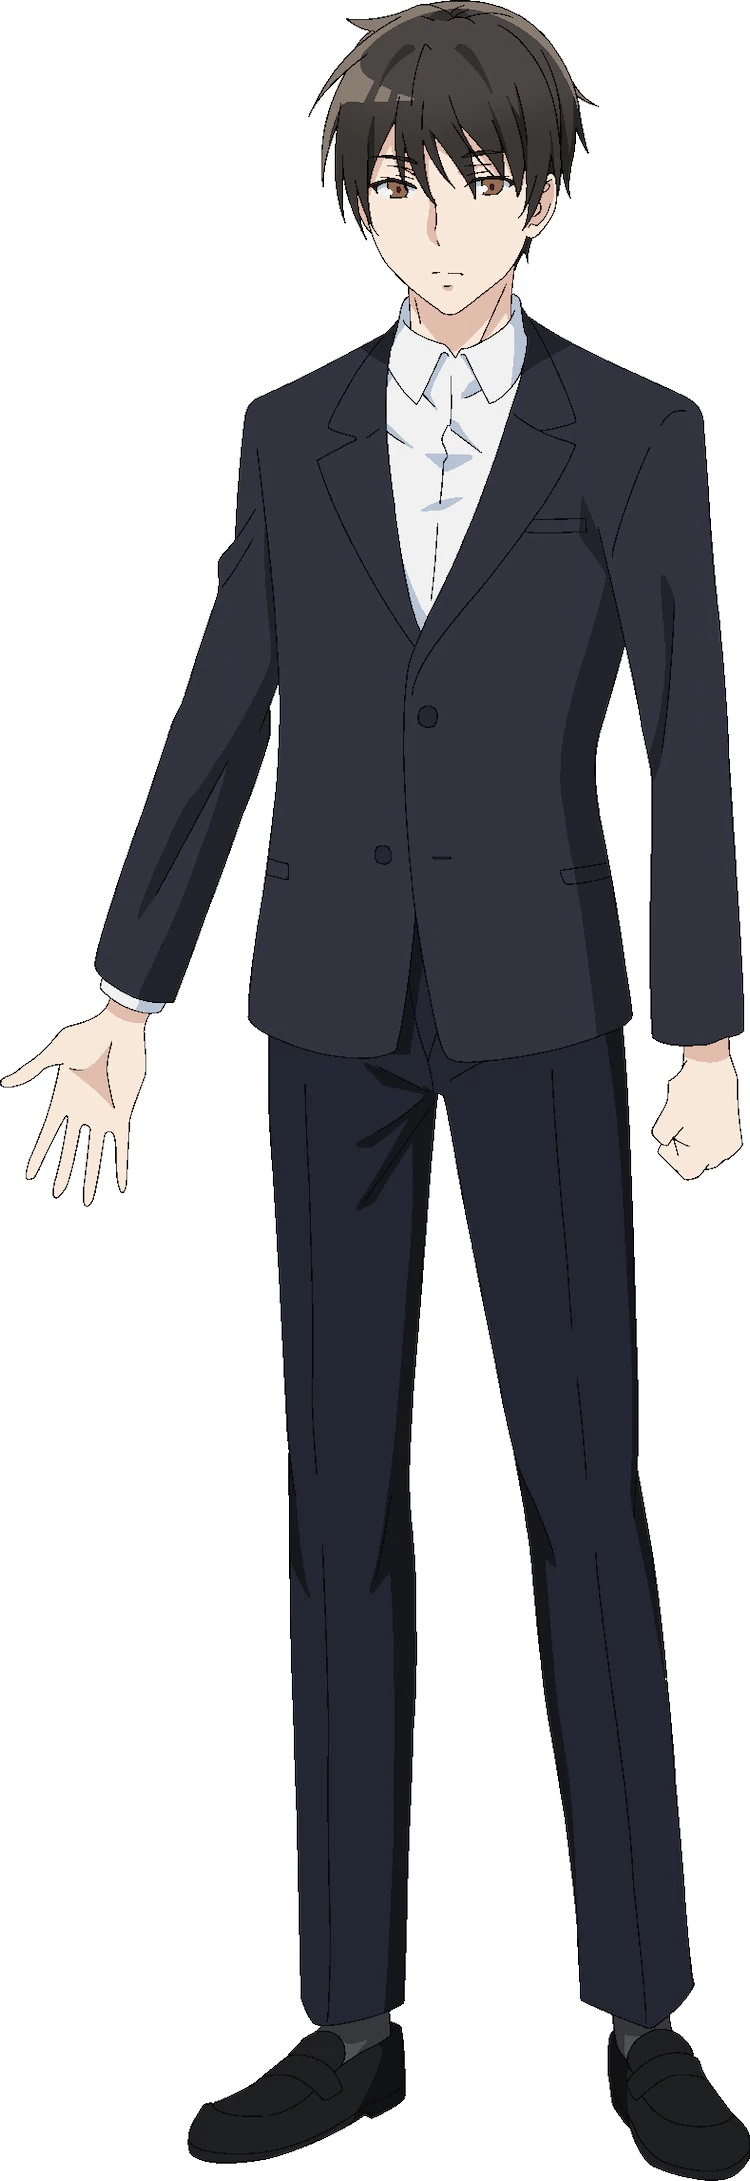 A character setting of Kimihiko Kimitsuka, the protagonist from the upcoming Tantei wa Mou, Shindeiru. TV anime.